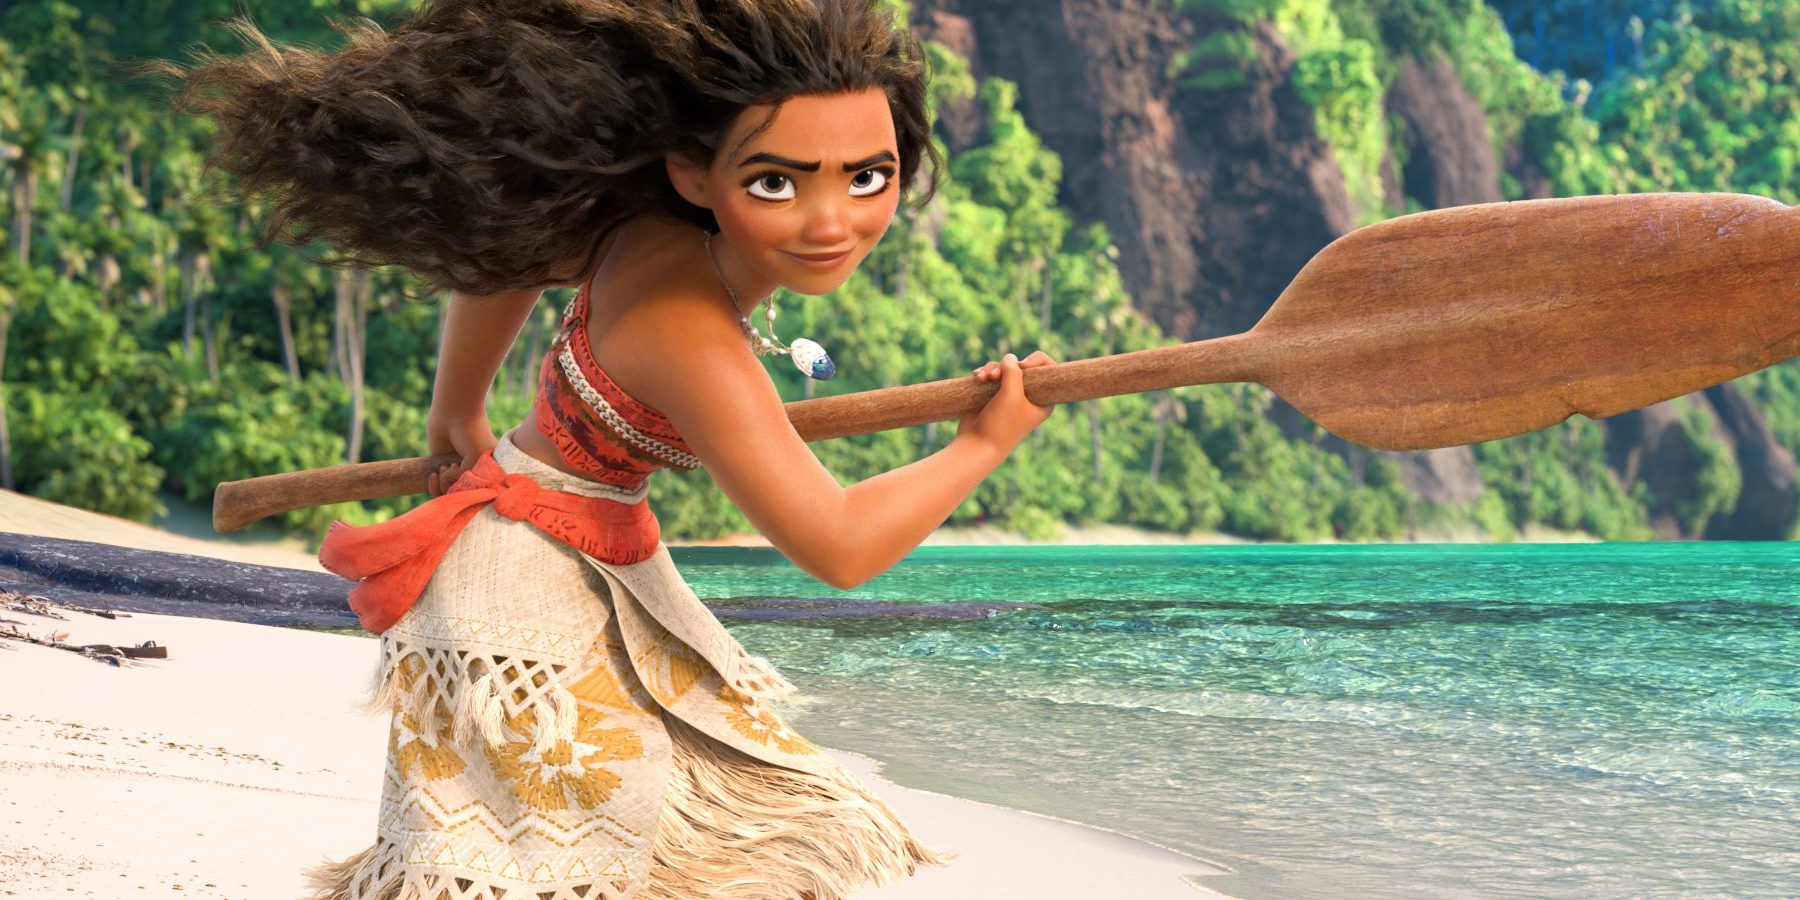 Oceania: la protagonista in una scena del film